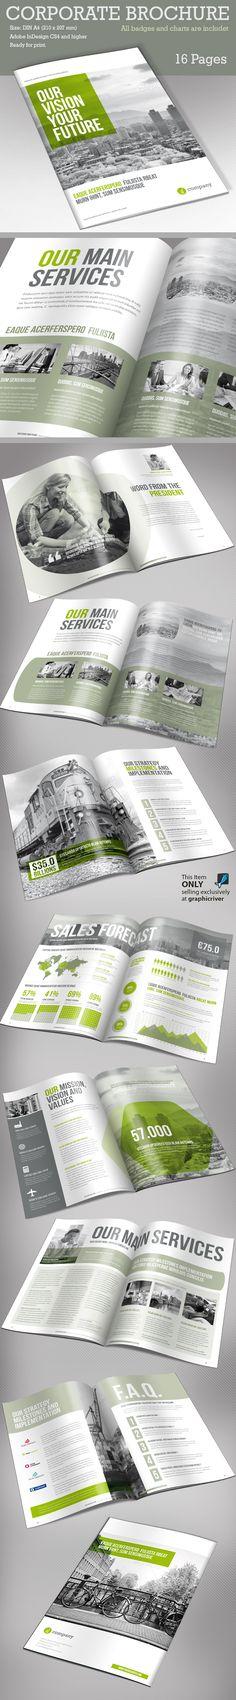 Corporate Brochure Vol 2 by Paulnomade Paulnomade, via Behance